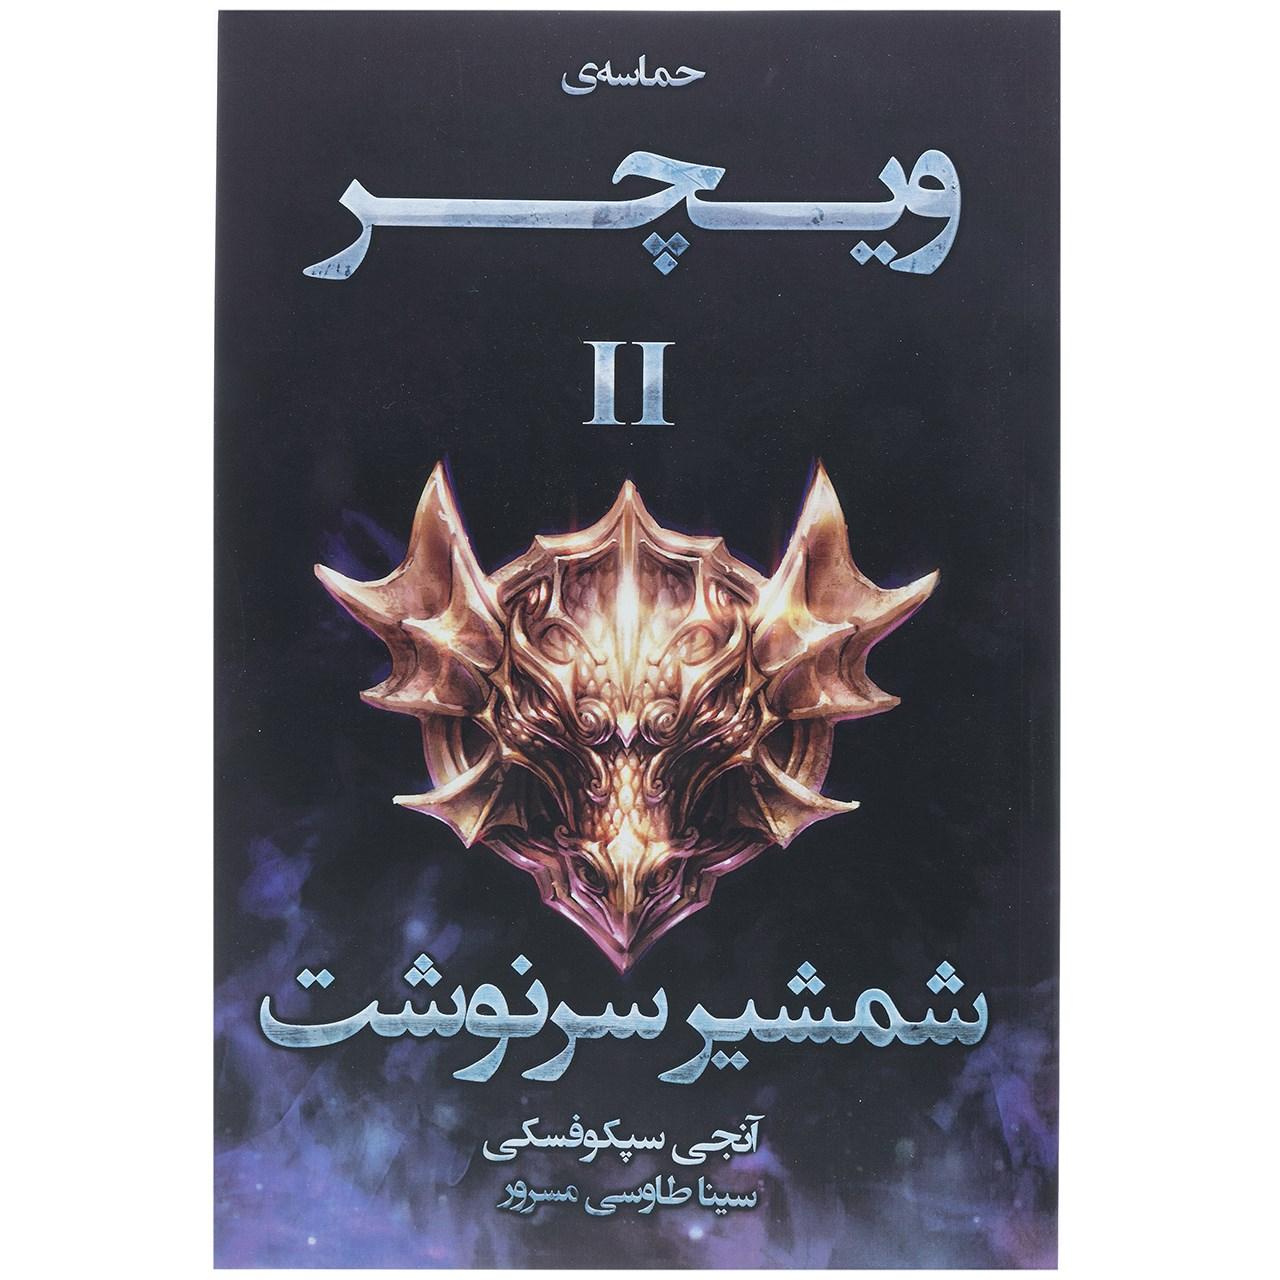 کتاب حماسه ی ویچر 2 اثر آنجی سپکوفسکی